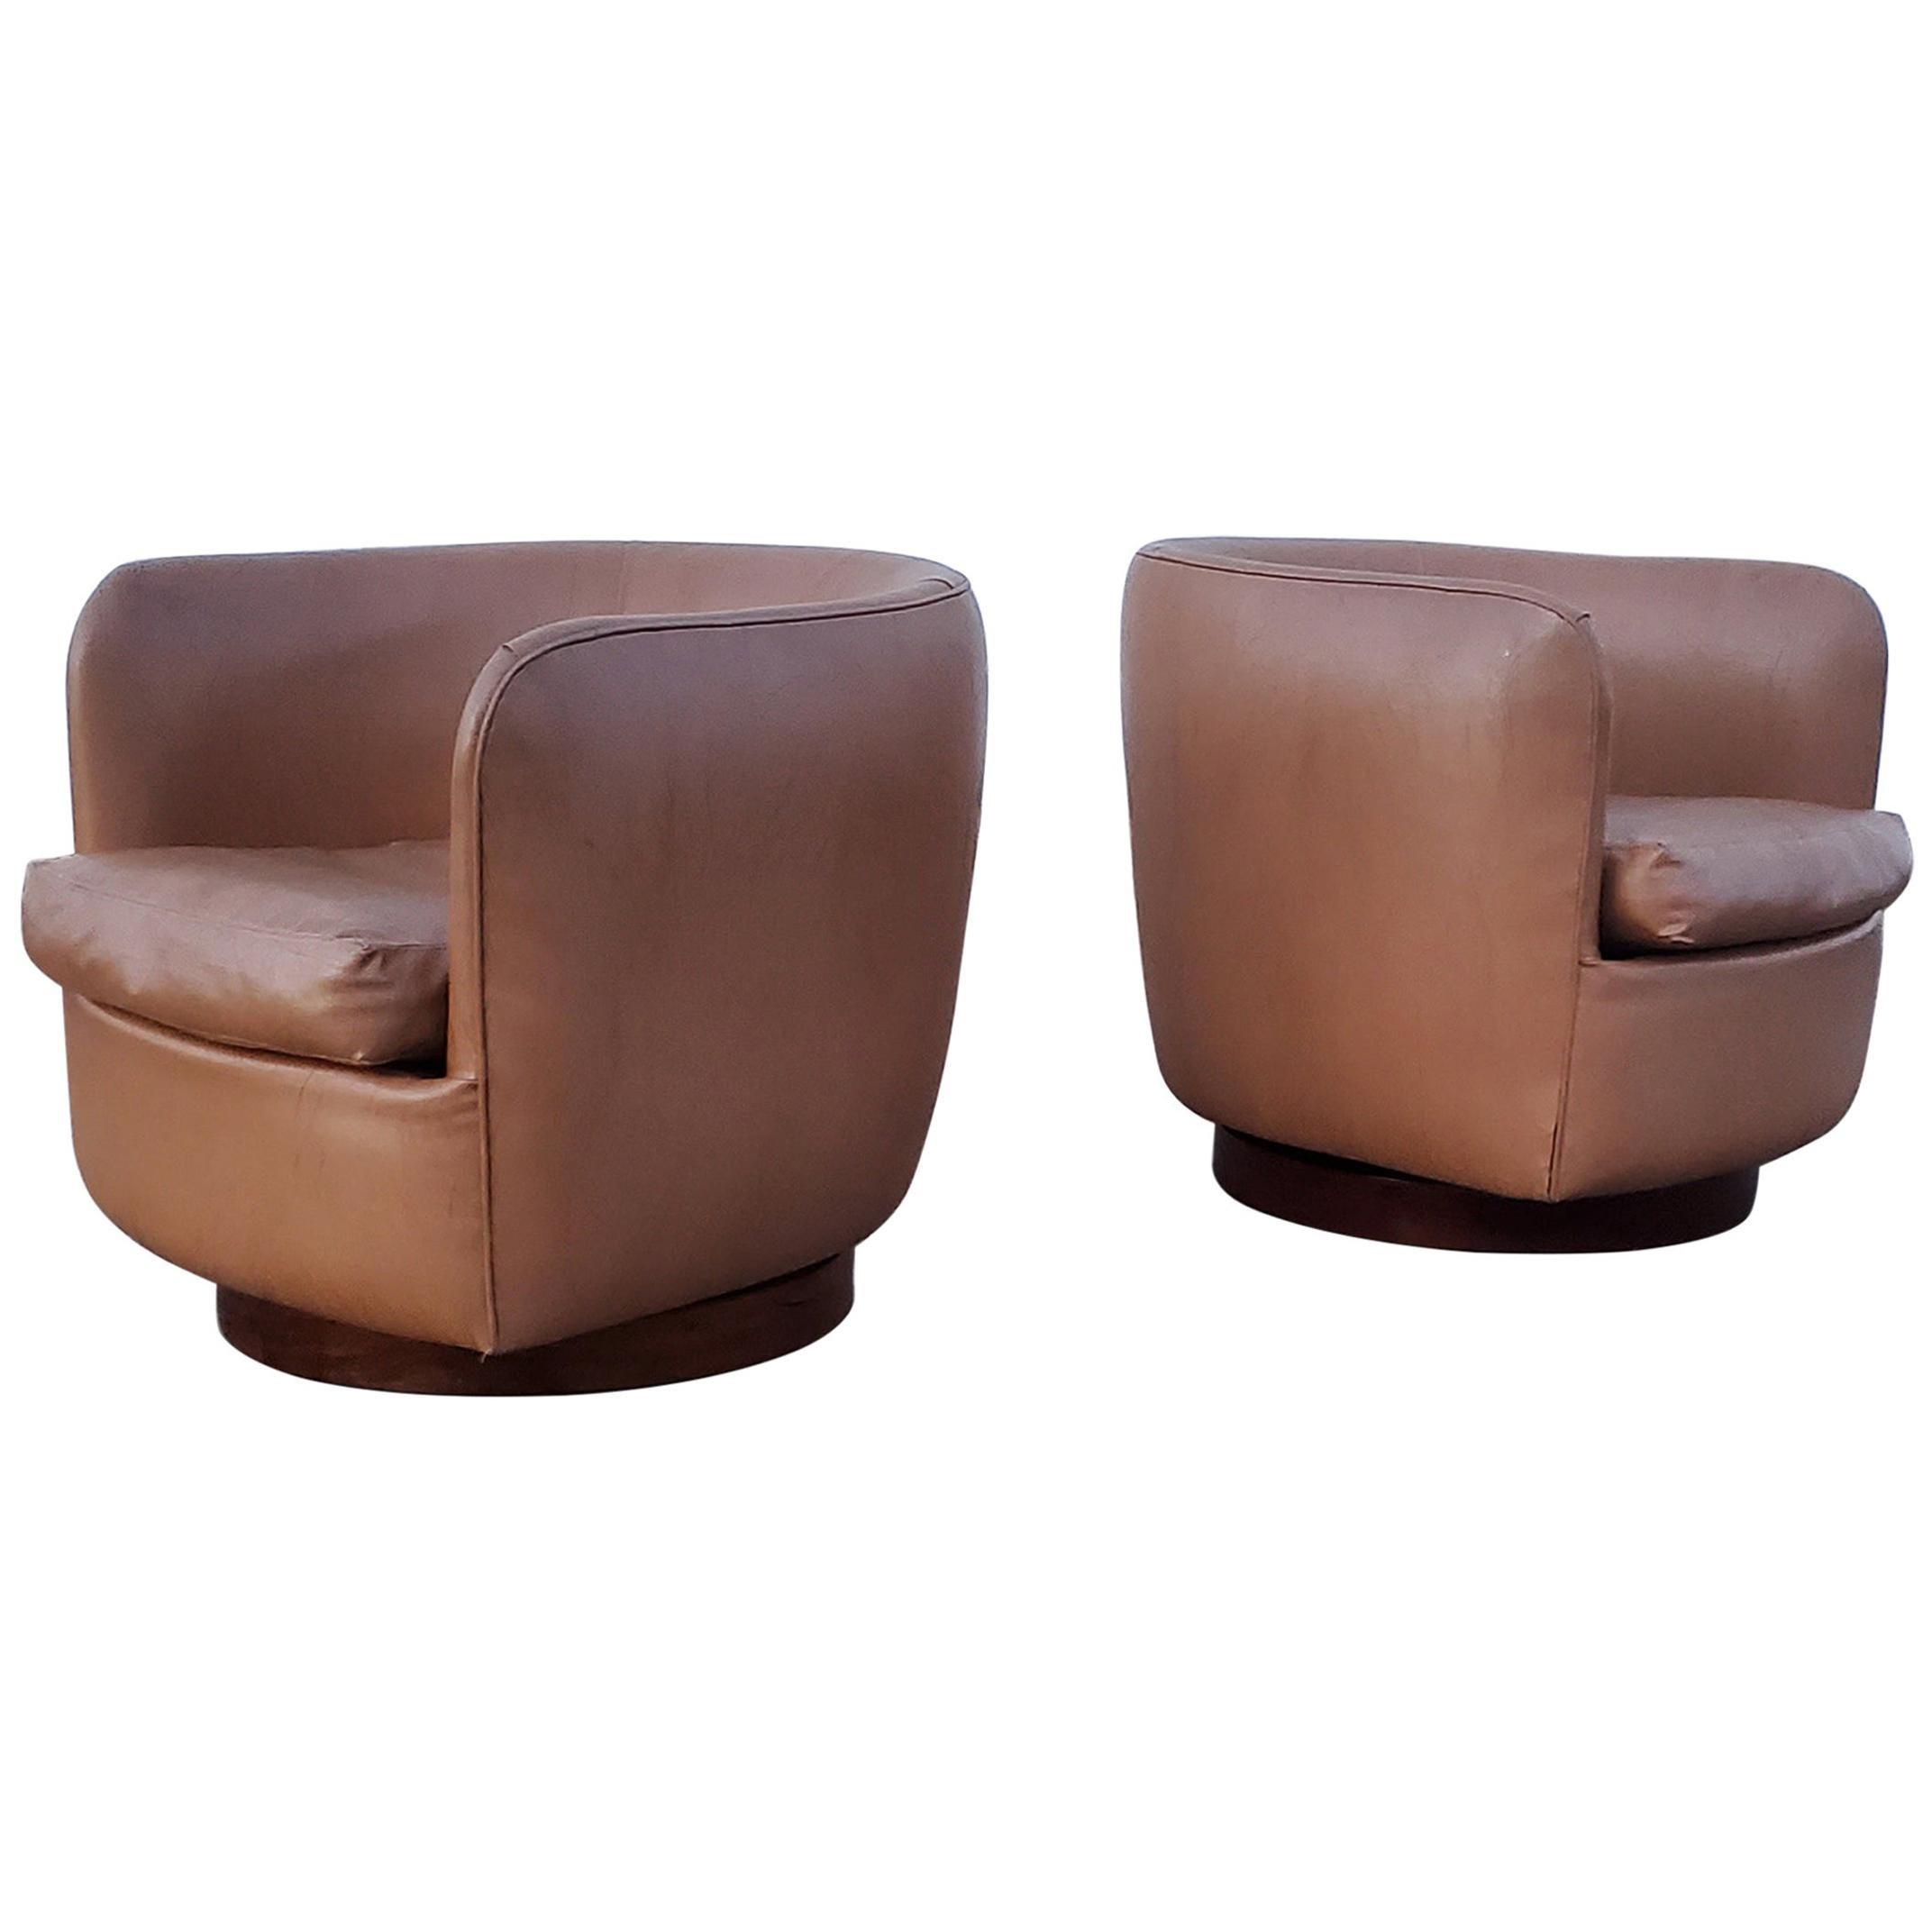 Pair of Milo Baughman for Thayer Coggin Tilt / Swivel Lounge Chairs